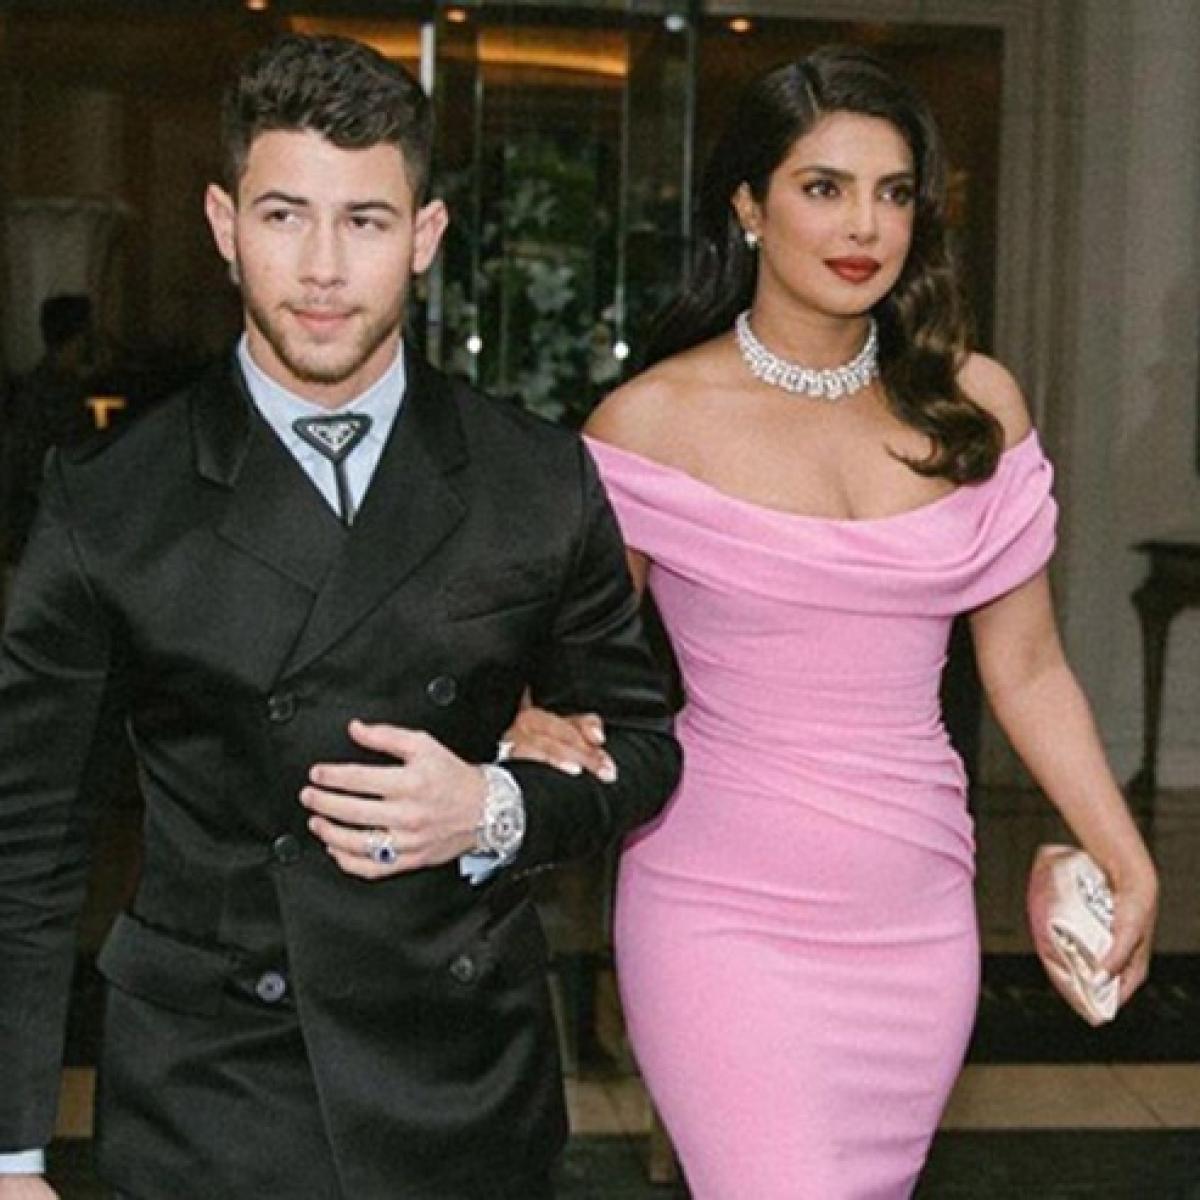 Doting wife Priyanka Chopra wipes off lipstick stains from Nick Jonas' lips at Golden Globes 2020